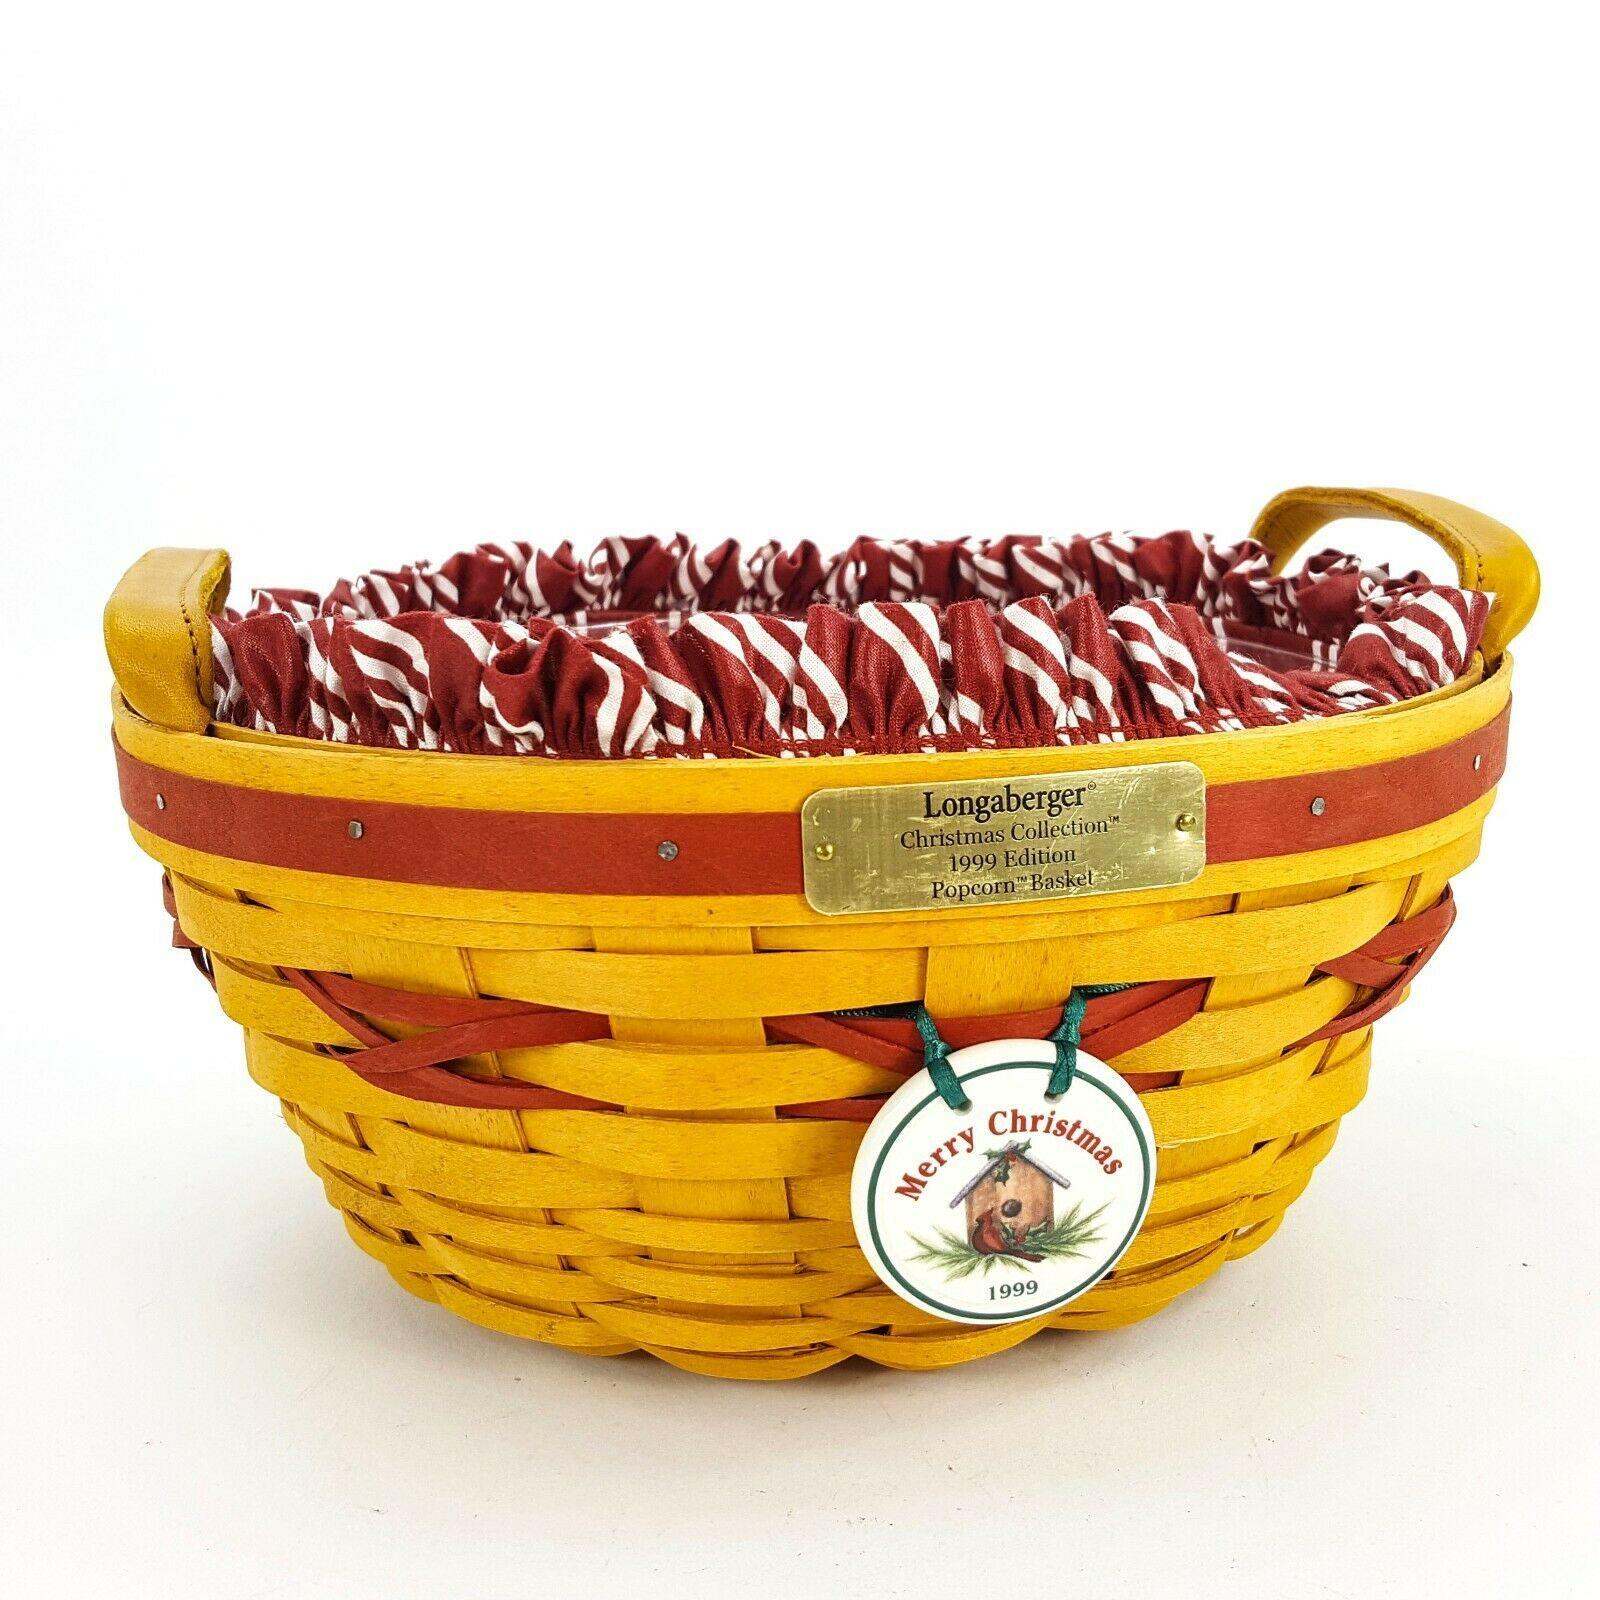 Longaberger 1999 Christmas Popcorn Basket w Protector & Red White Liner 15156